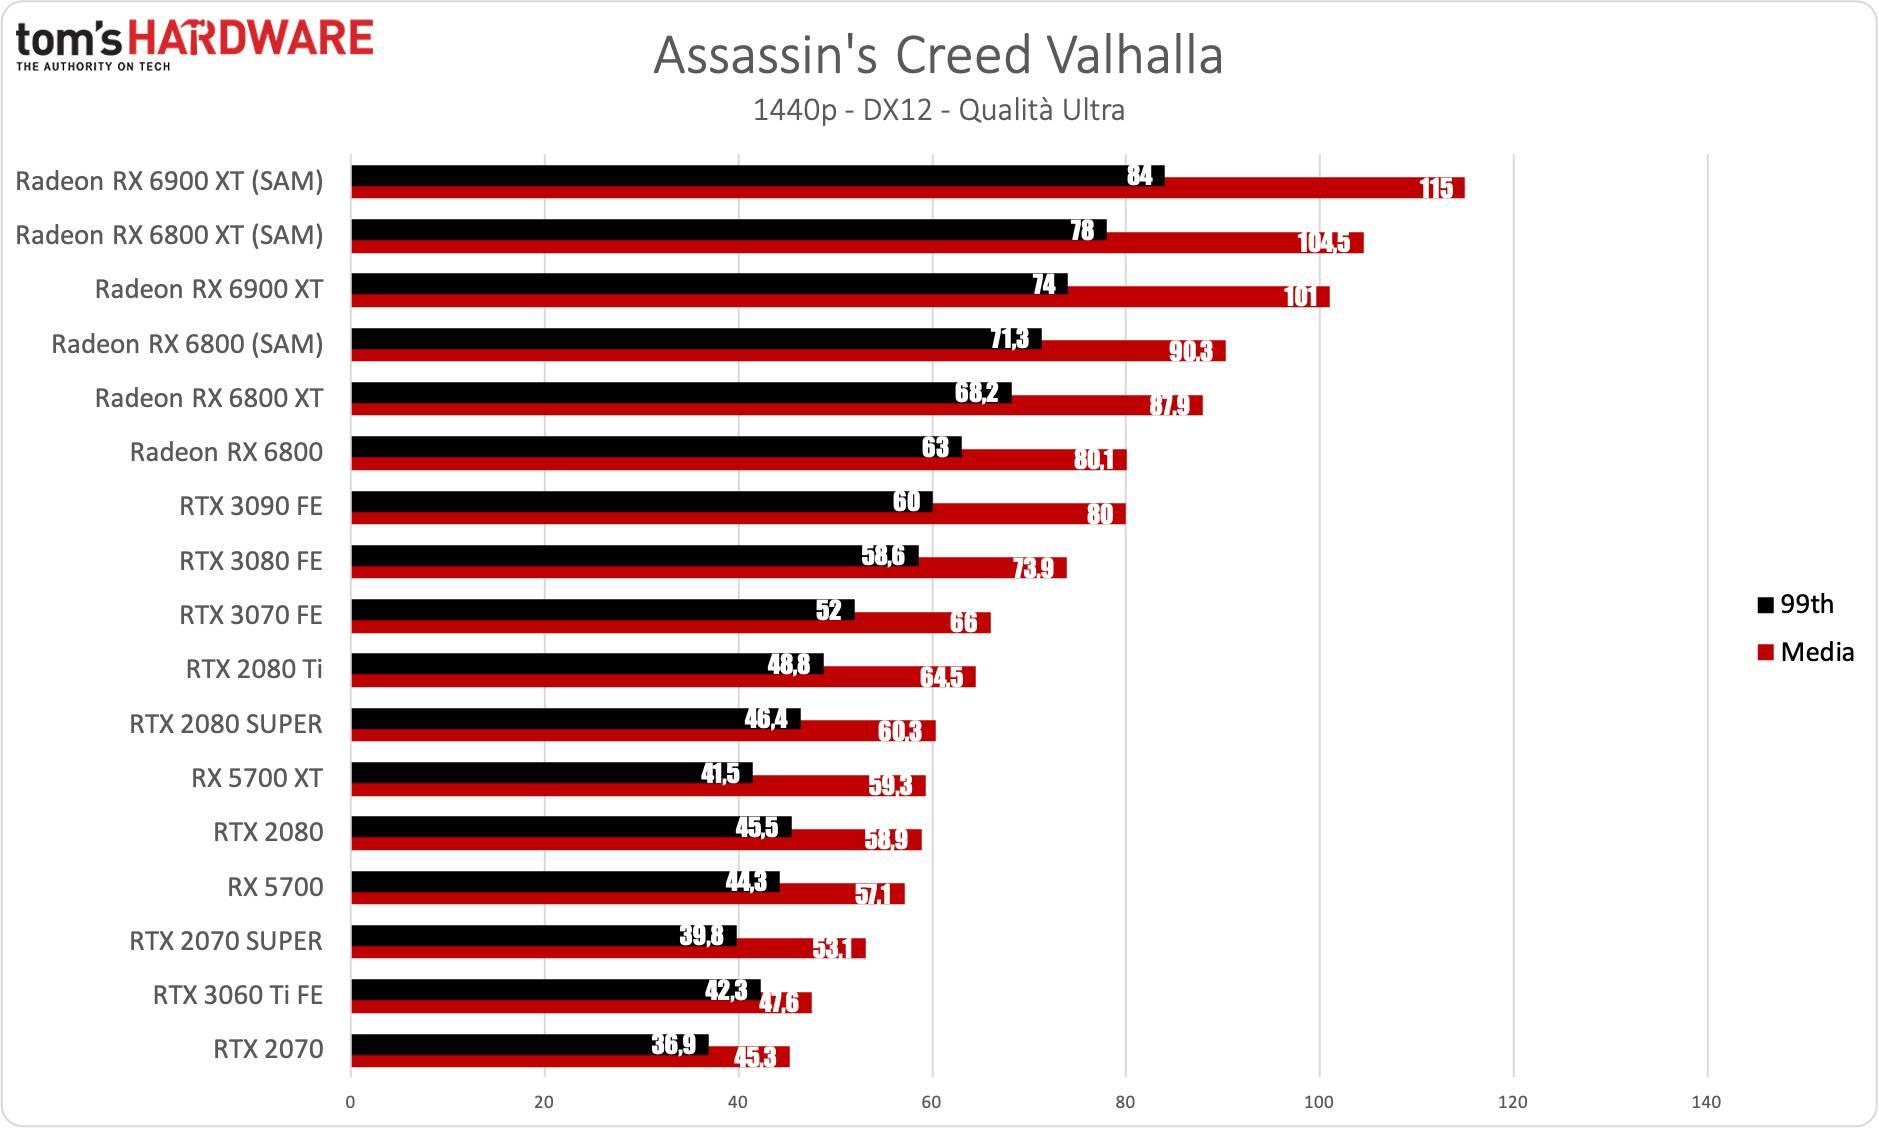 Benchmark Radeon RX 6900 XT - QHD - Assassin's Creed Valhalla